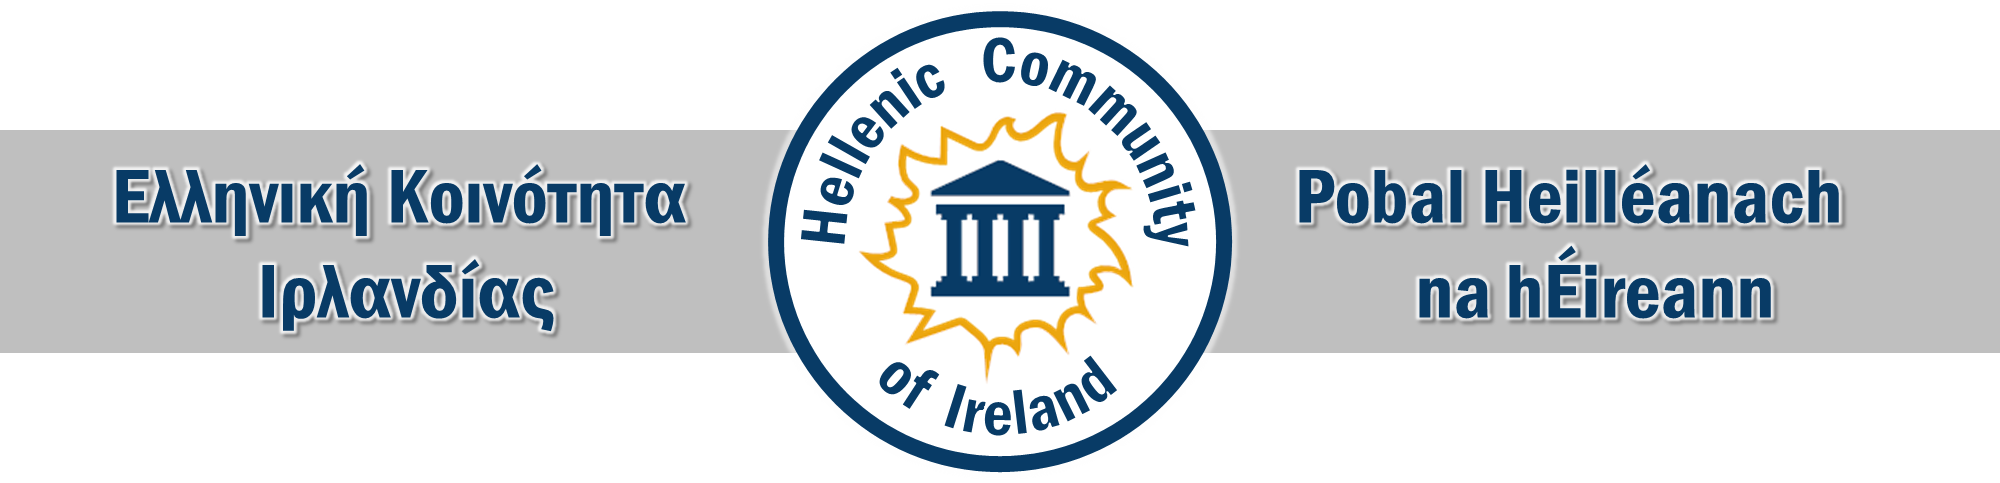 Hellenic Community of Ireland